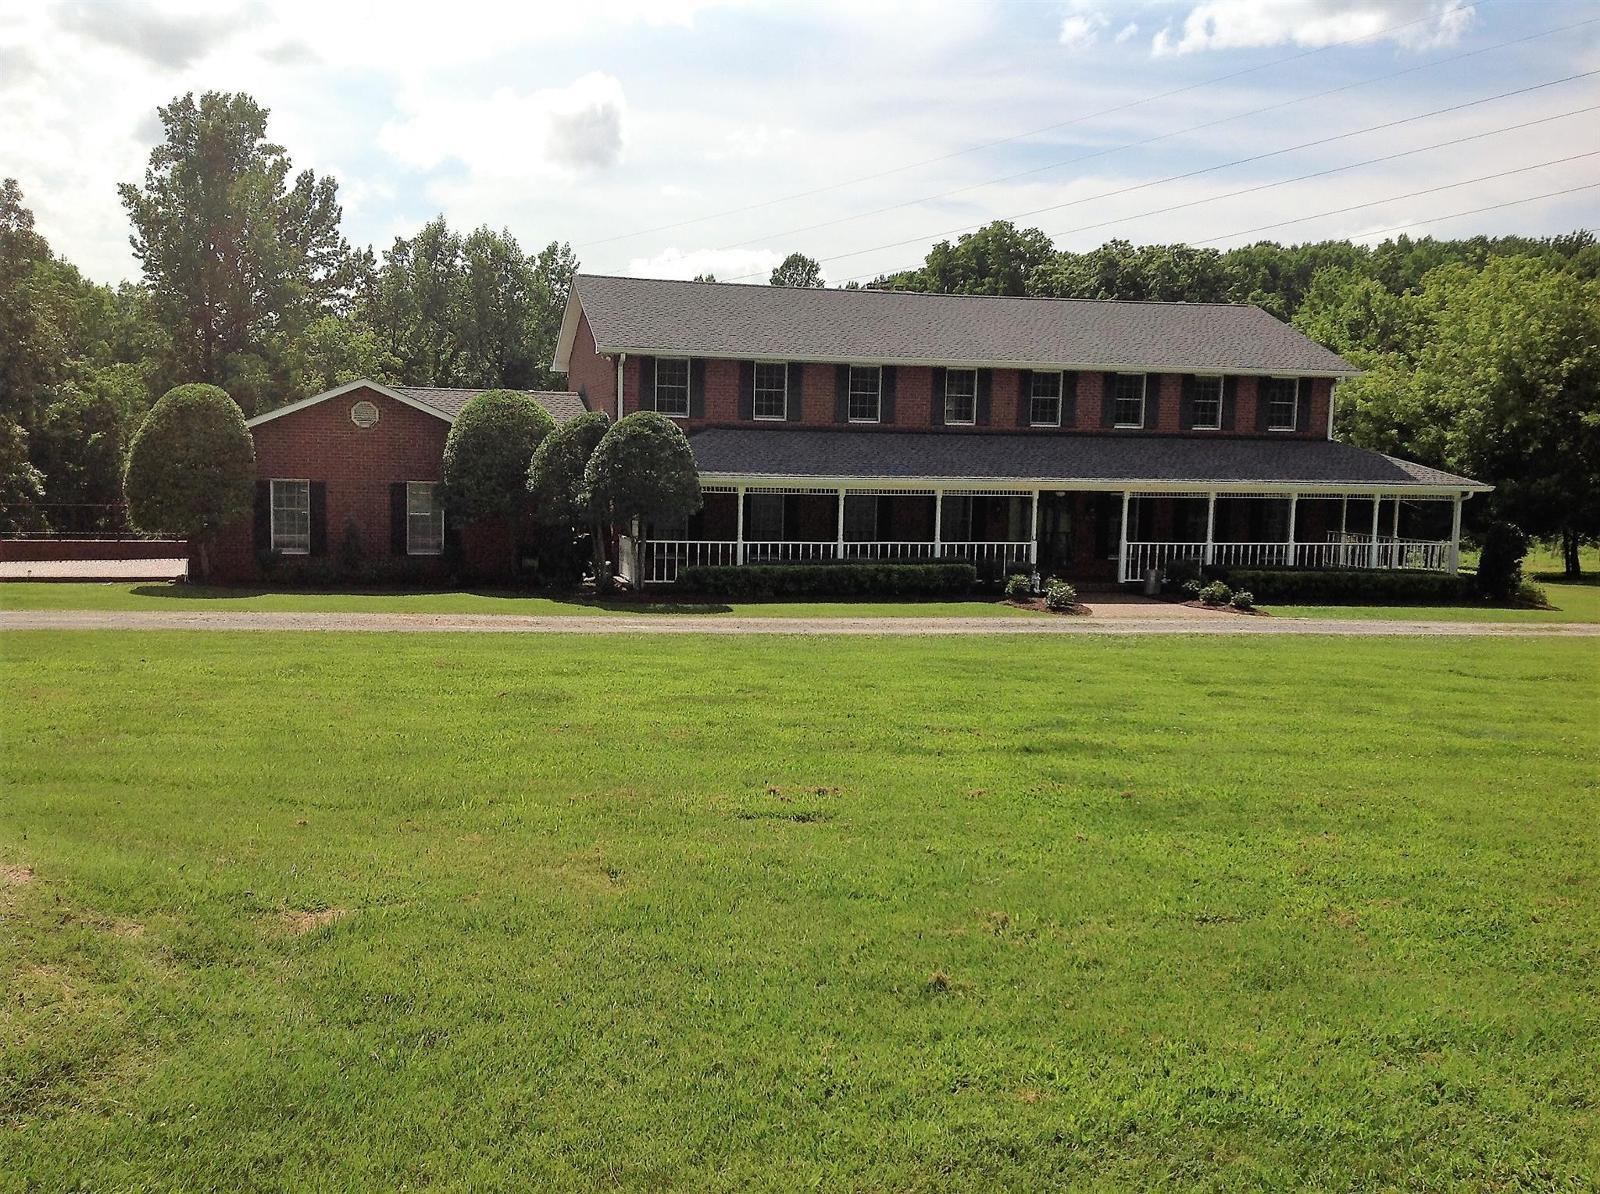 900 BASS LN, MT JULIET, TN — MLS 1841755 — CENTURY 21 Real Estate